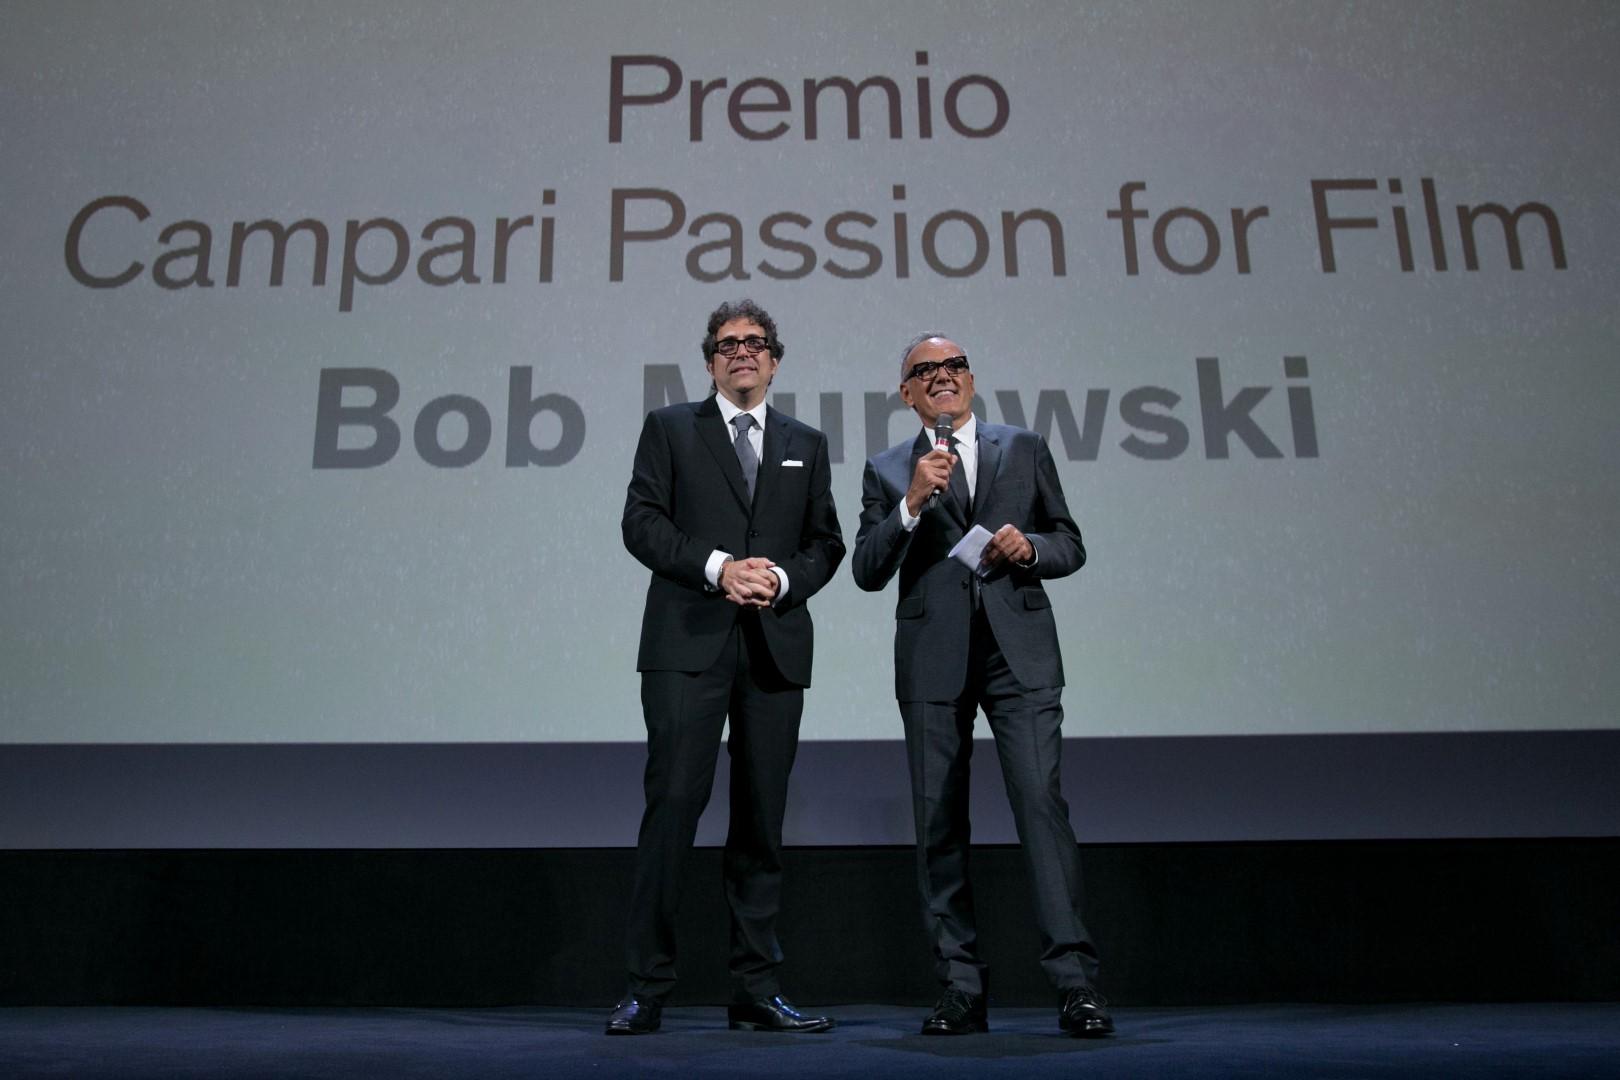 Festival Cinema Venezia 2018 Campari Passion for Film